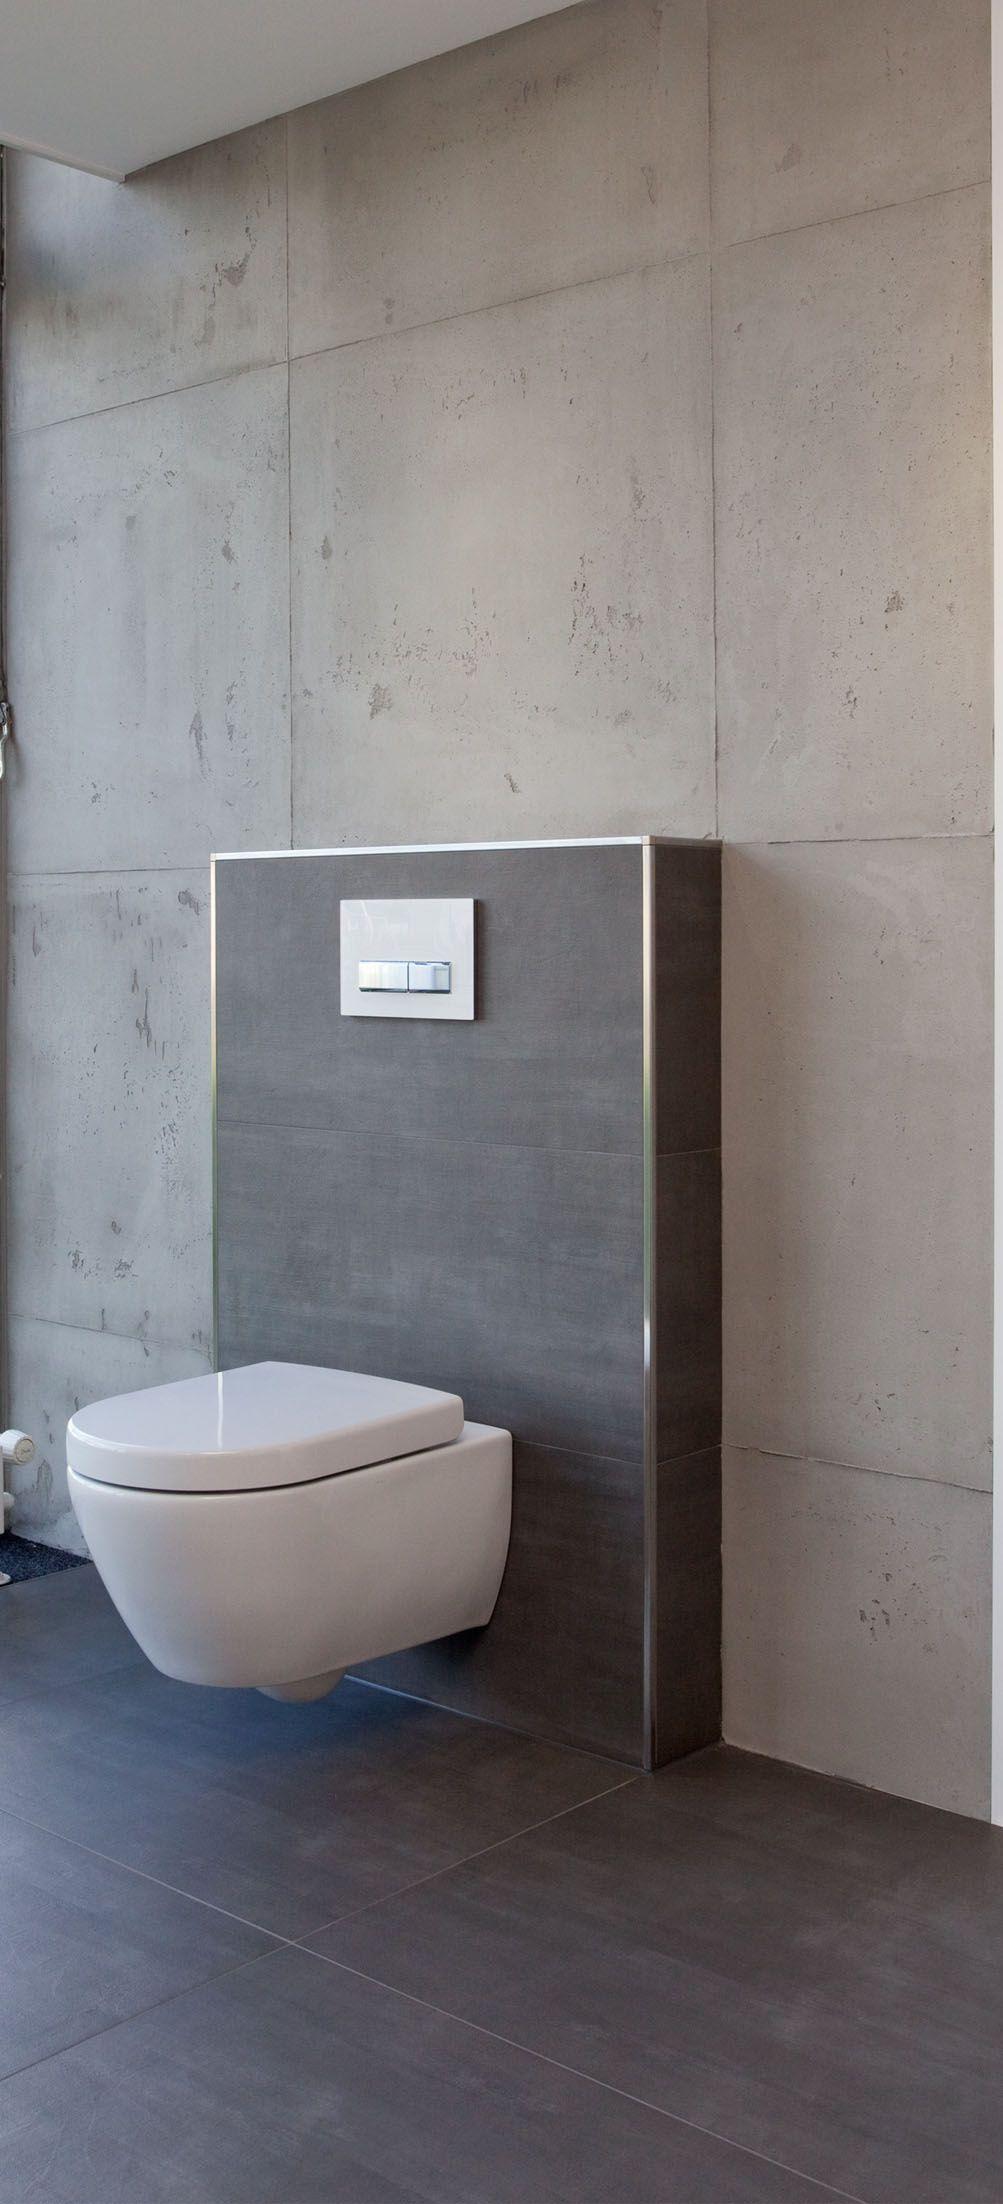 Badezimmer design neu fliesen in betonoptik kombiniert mit gespachteltem beton made by fr